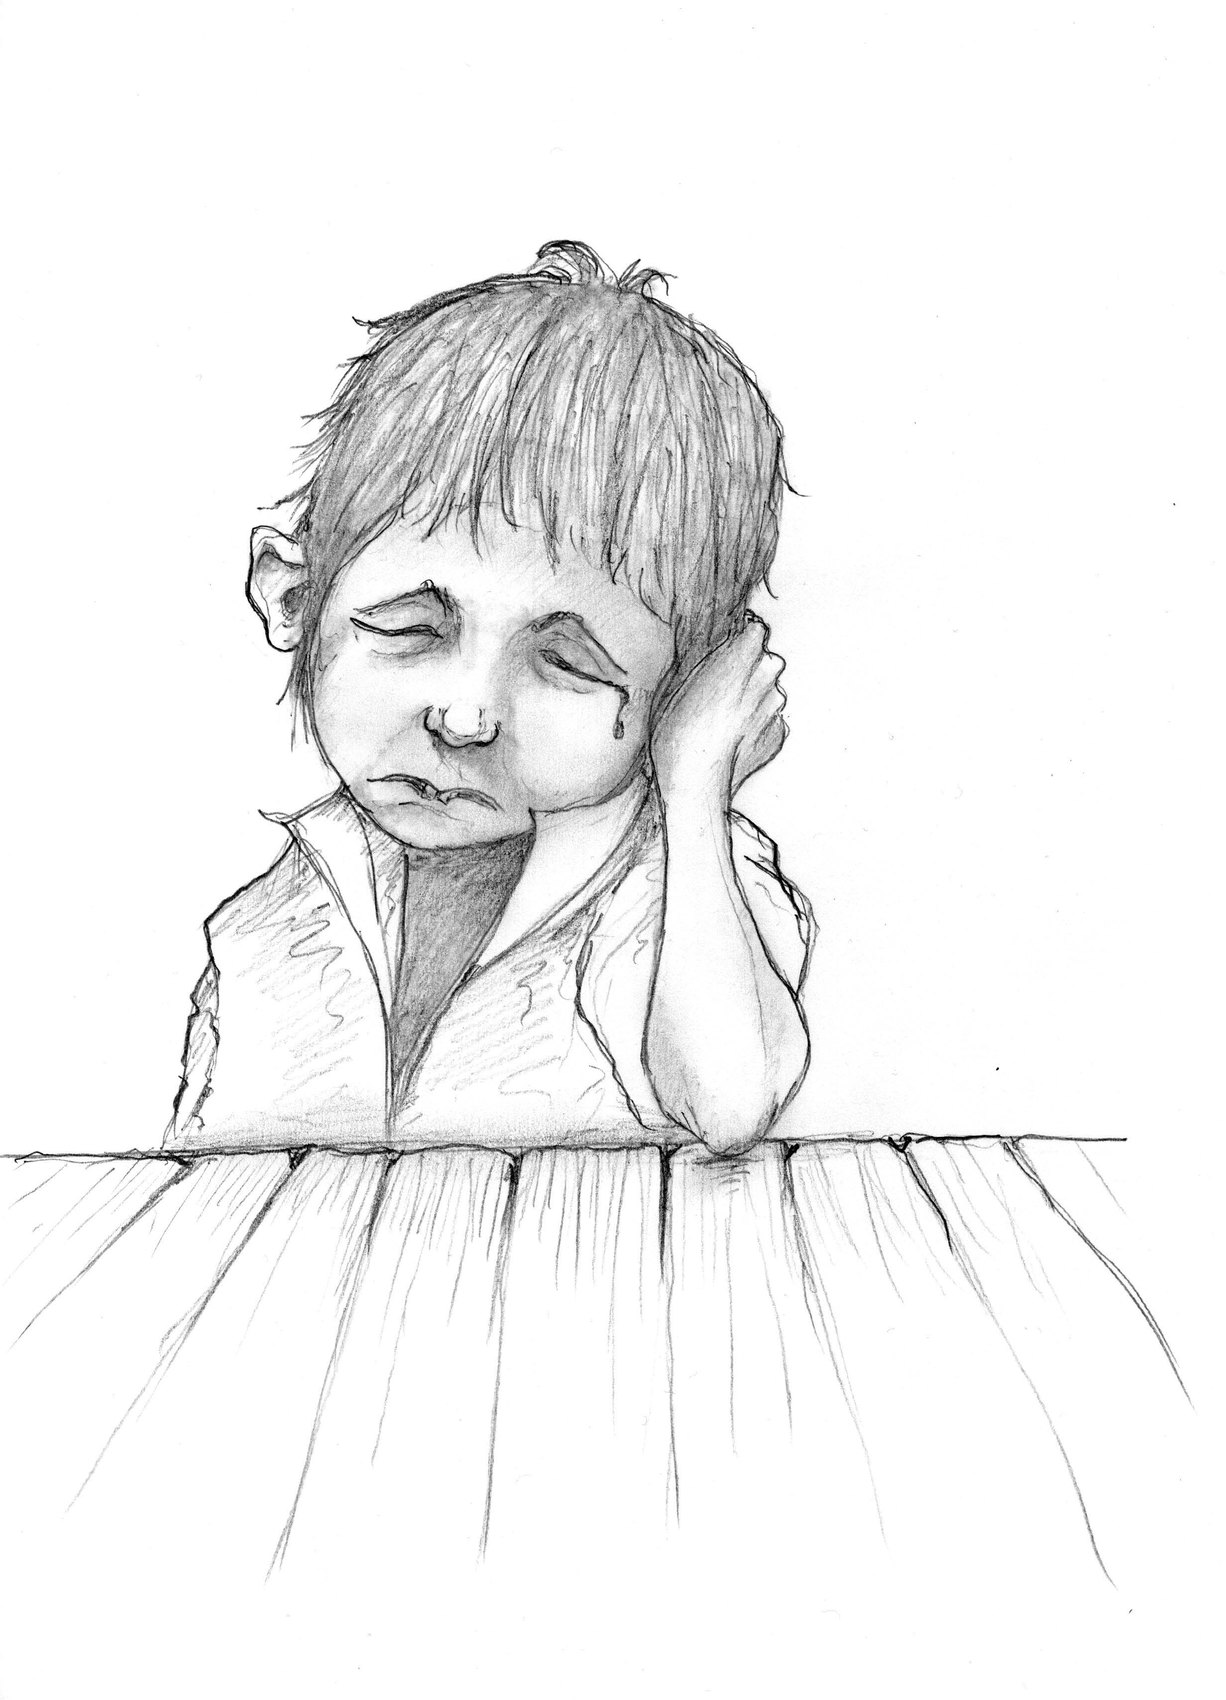 Dessin petit lutin triste d 39 apr s monge - Dessin triste ...